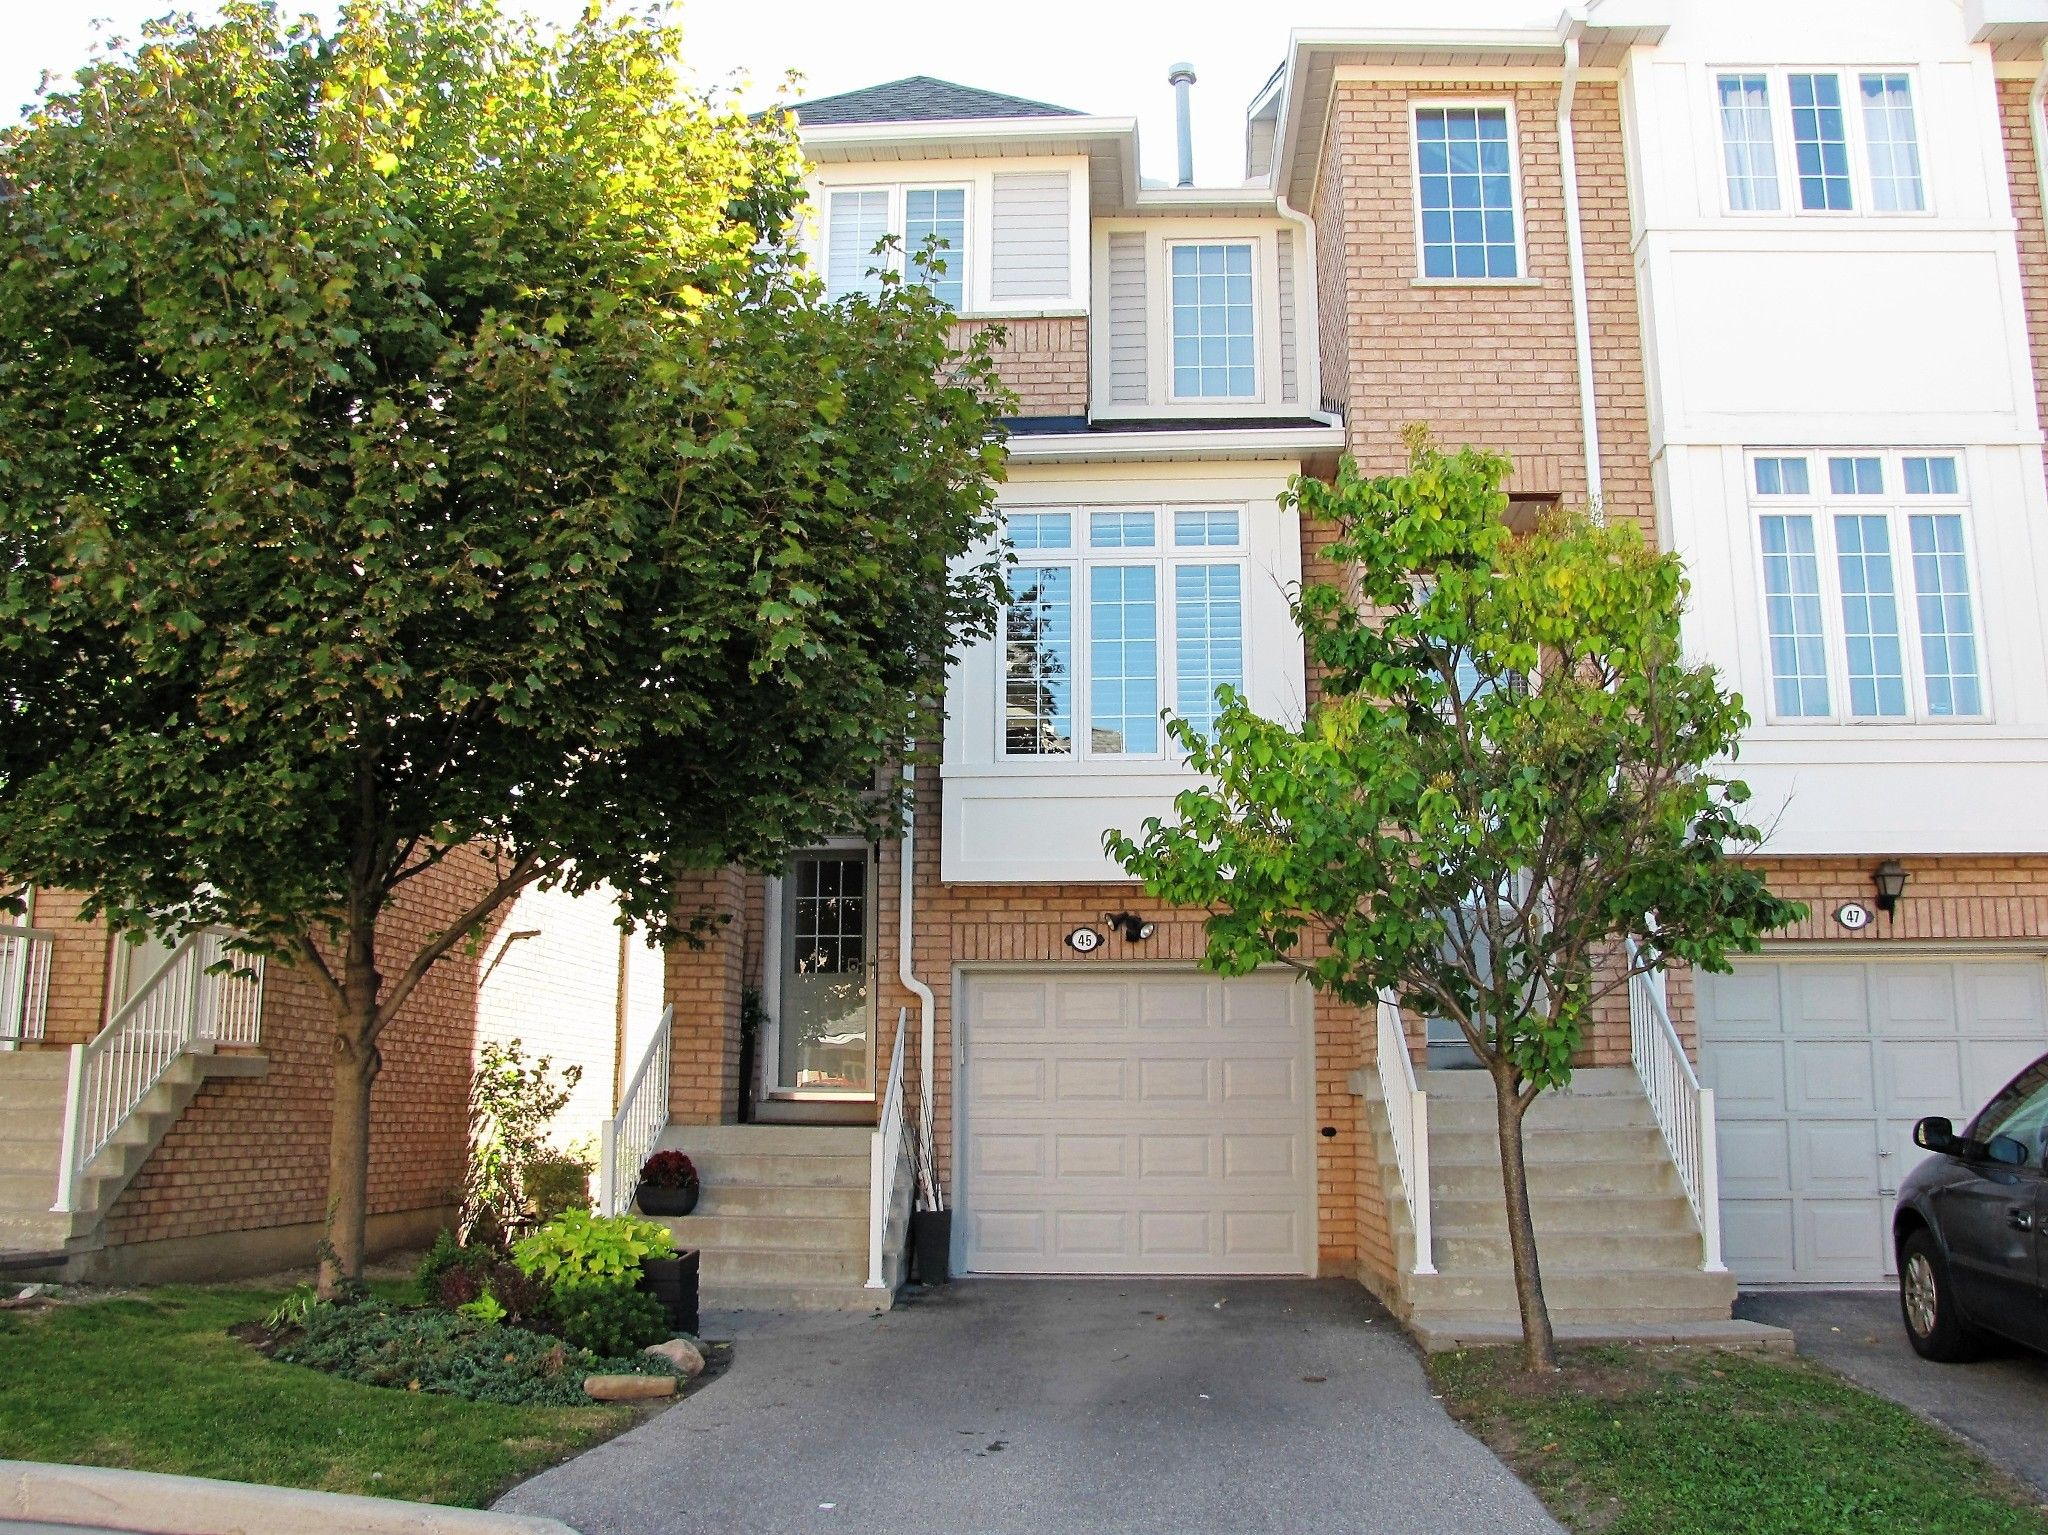 Main Photo: 45 280 Hillcrest Avenue in Mississauga: Cooksville Condo for sale : MLS®# W3634474